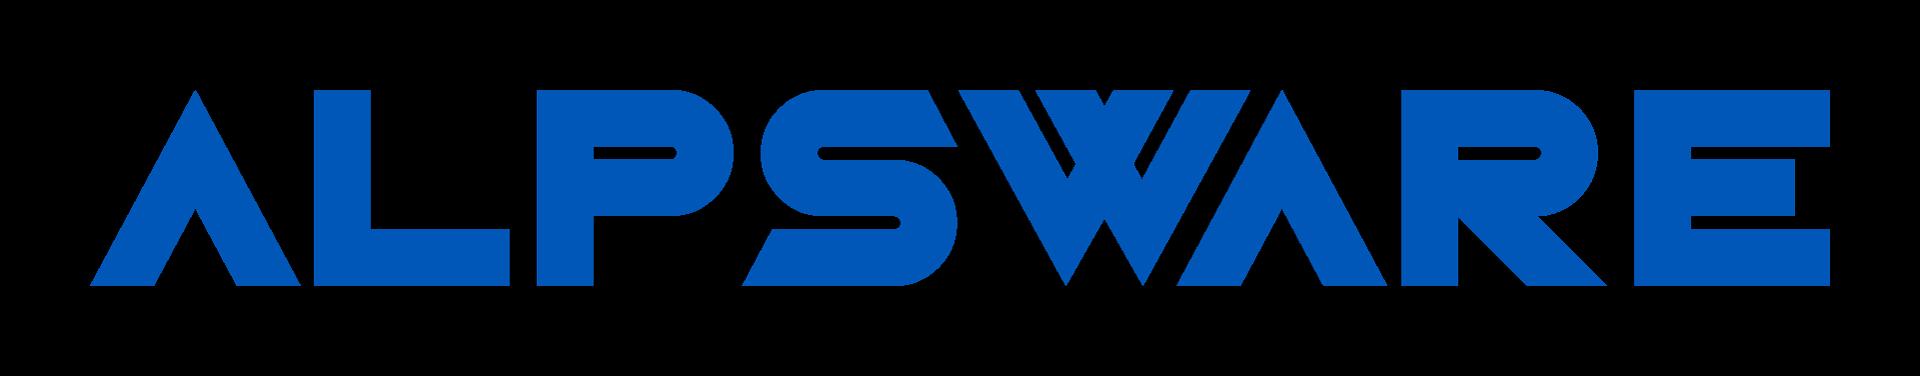 Alpsware GmbH